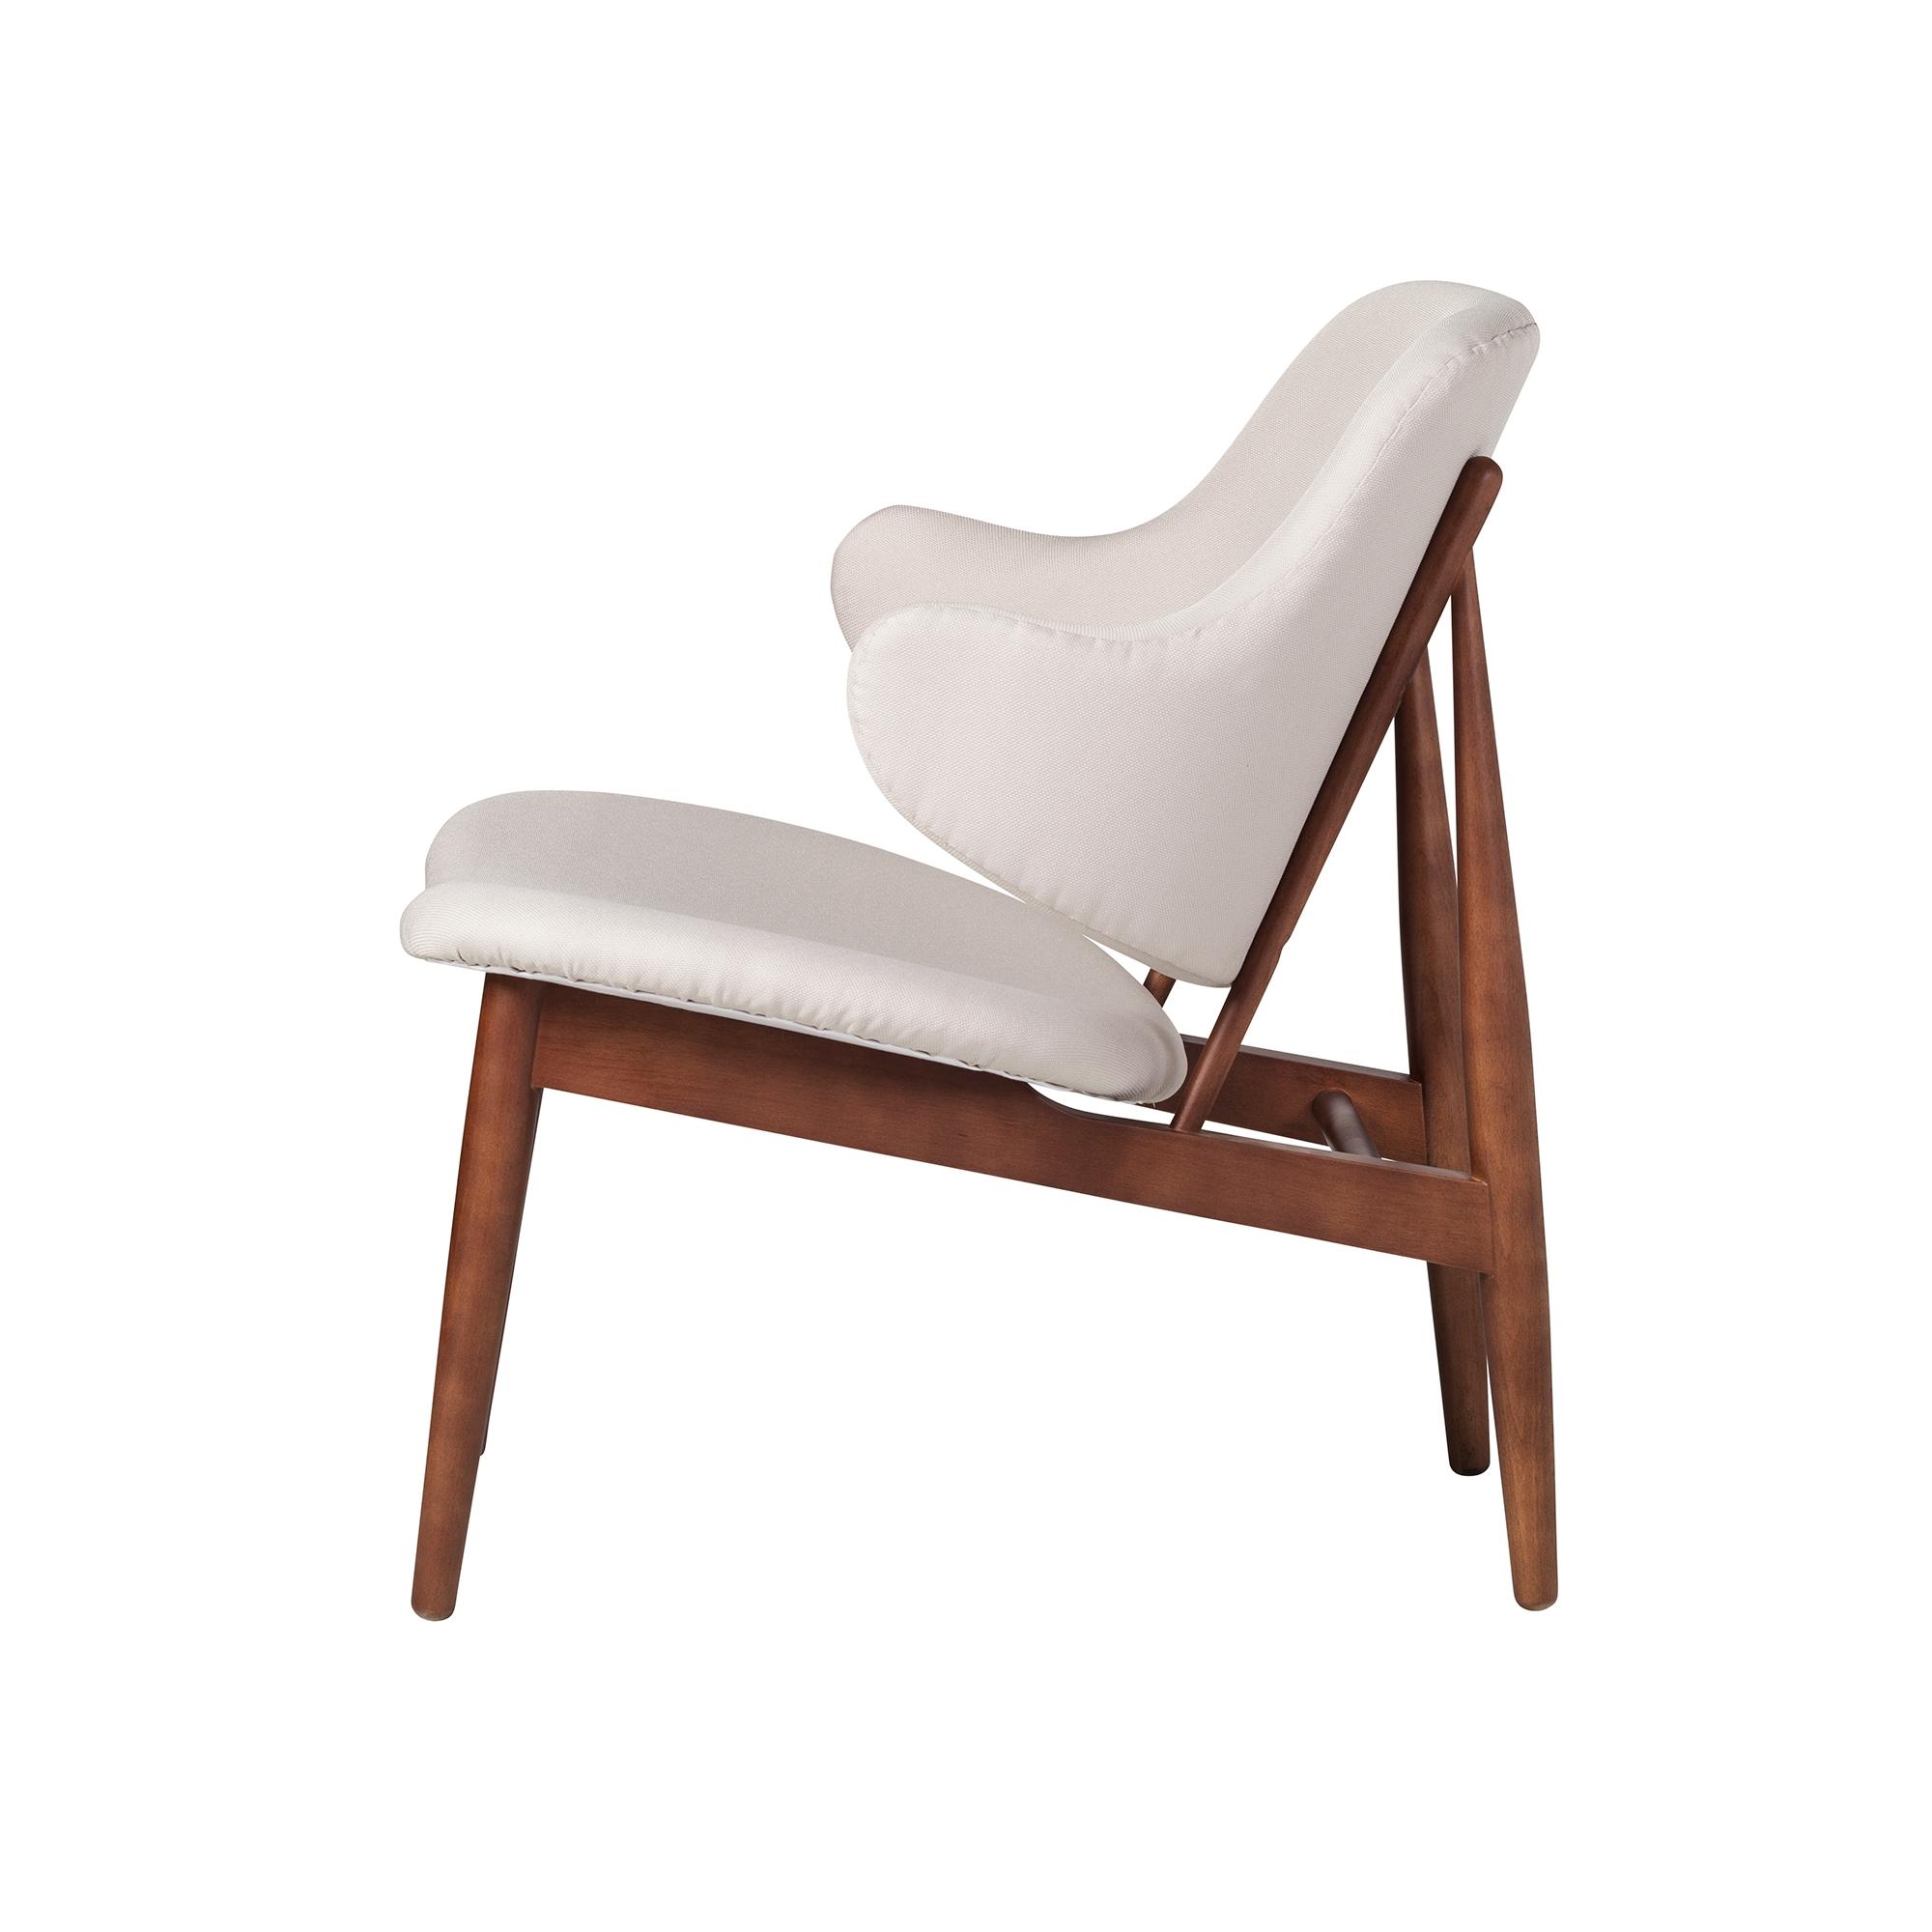 Pleasing Romi Wood Lounge Chair In White European Linen Alphanode Cool Chair Designs And Ideas Alphanodeonline